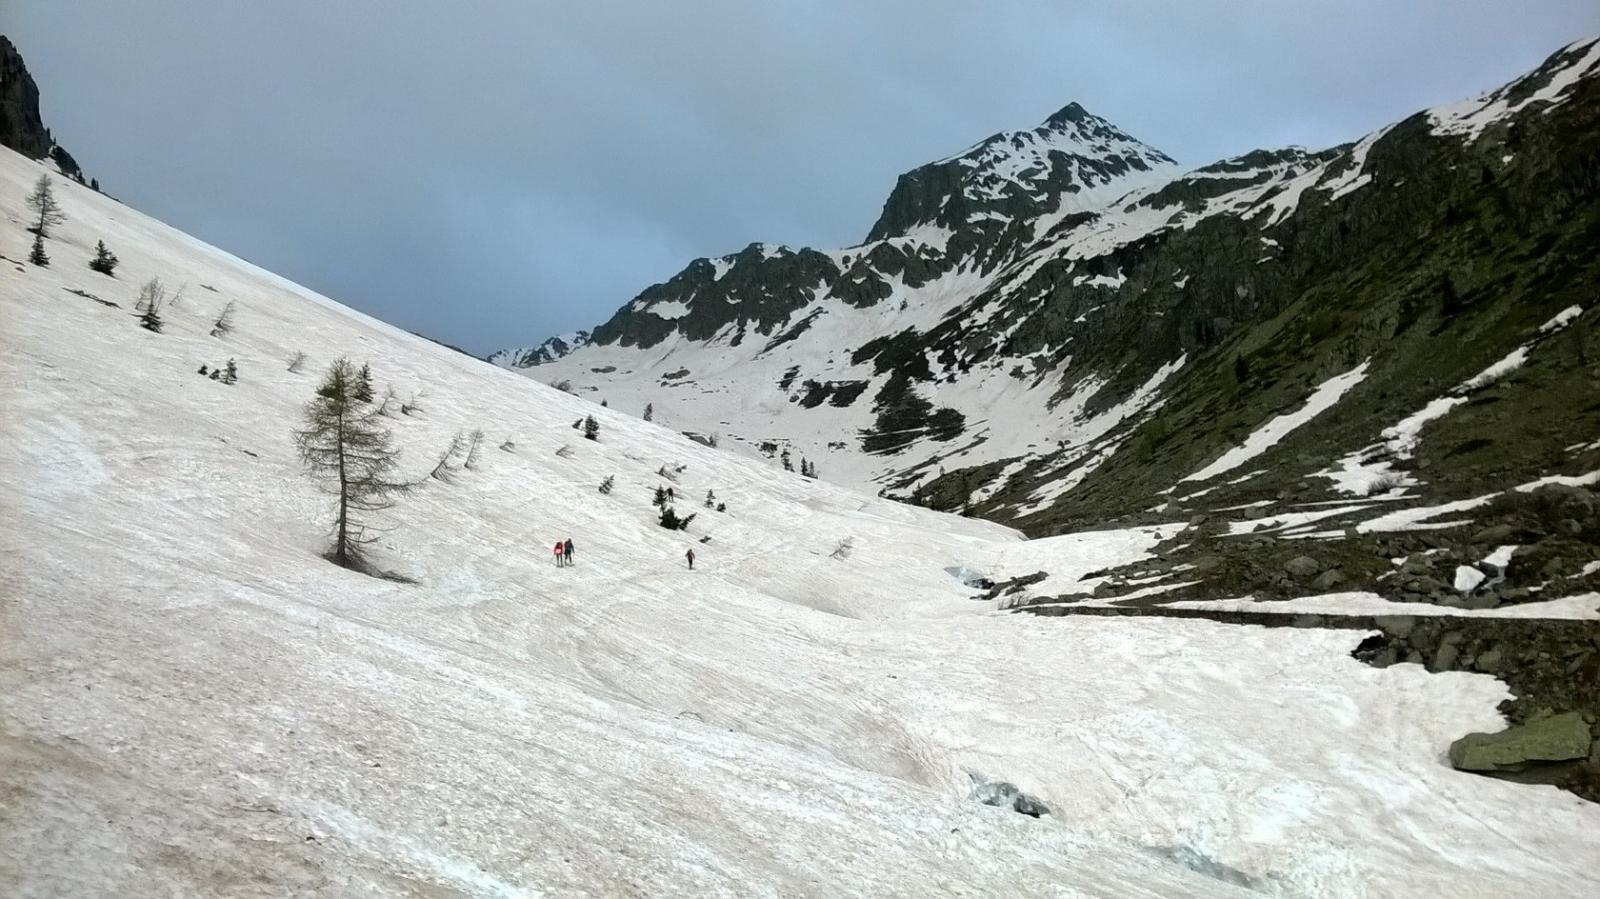 Neve da subito